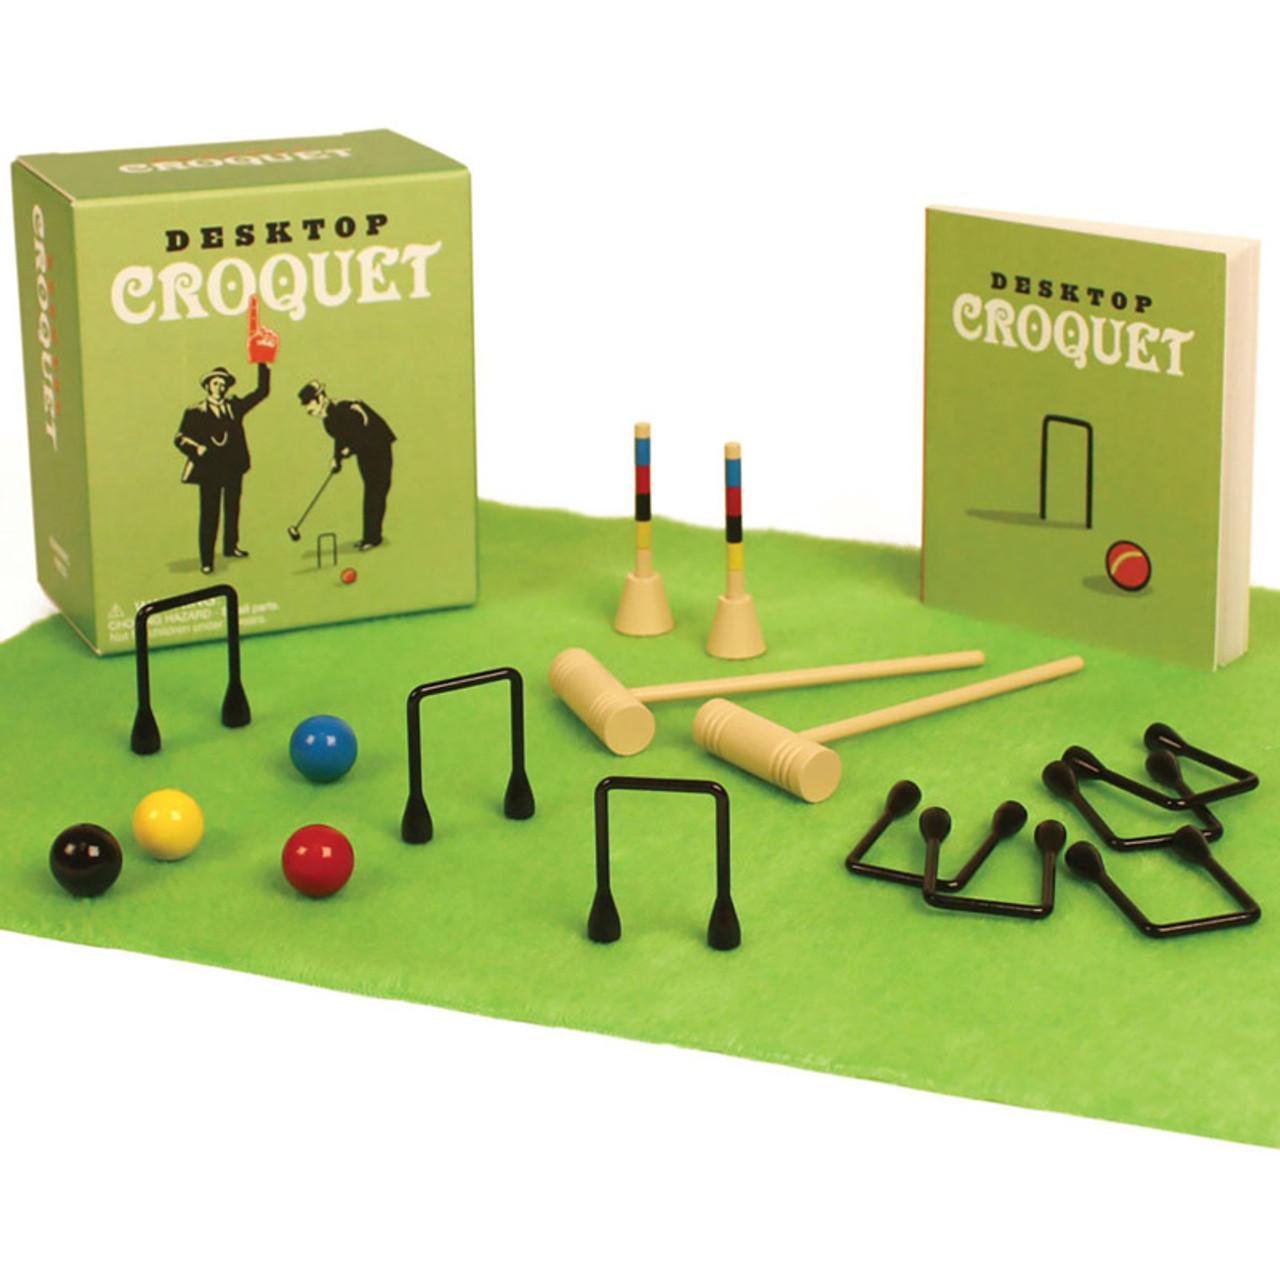 Mini Desktop Croquet Game